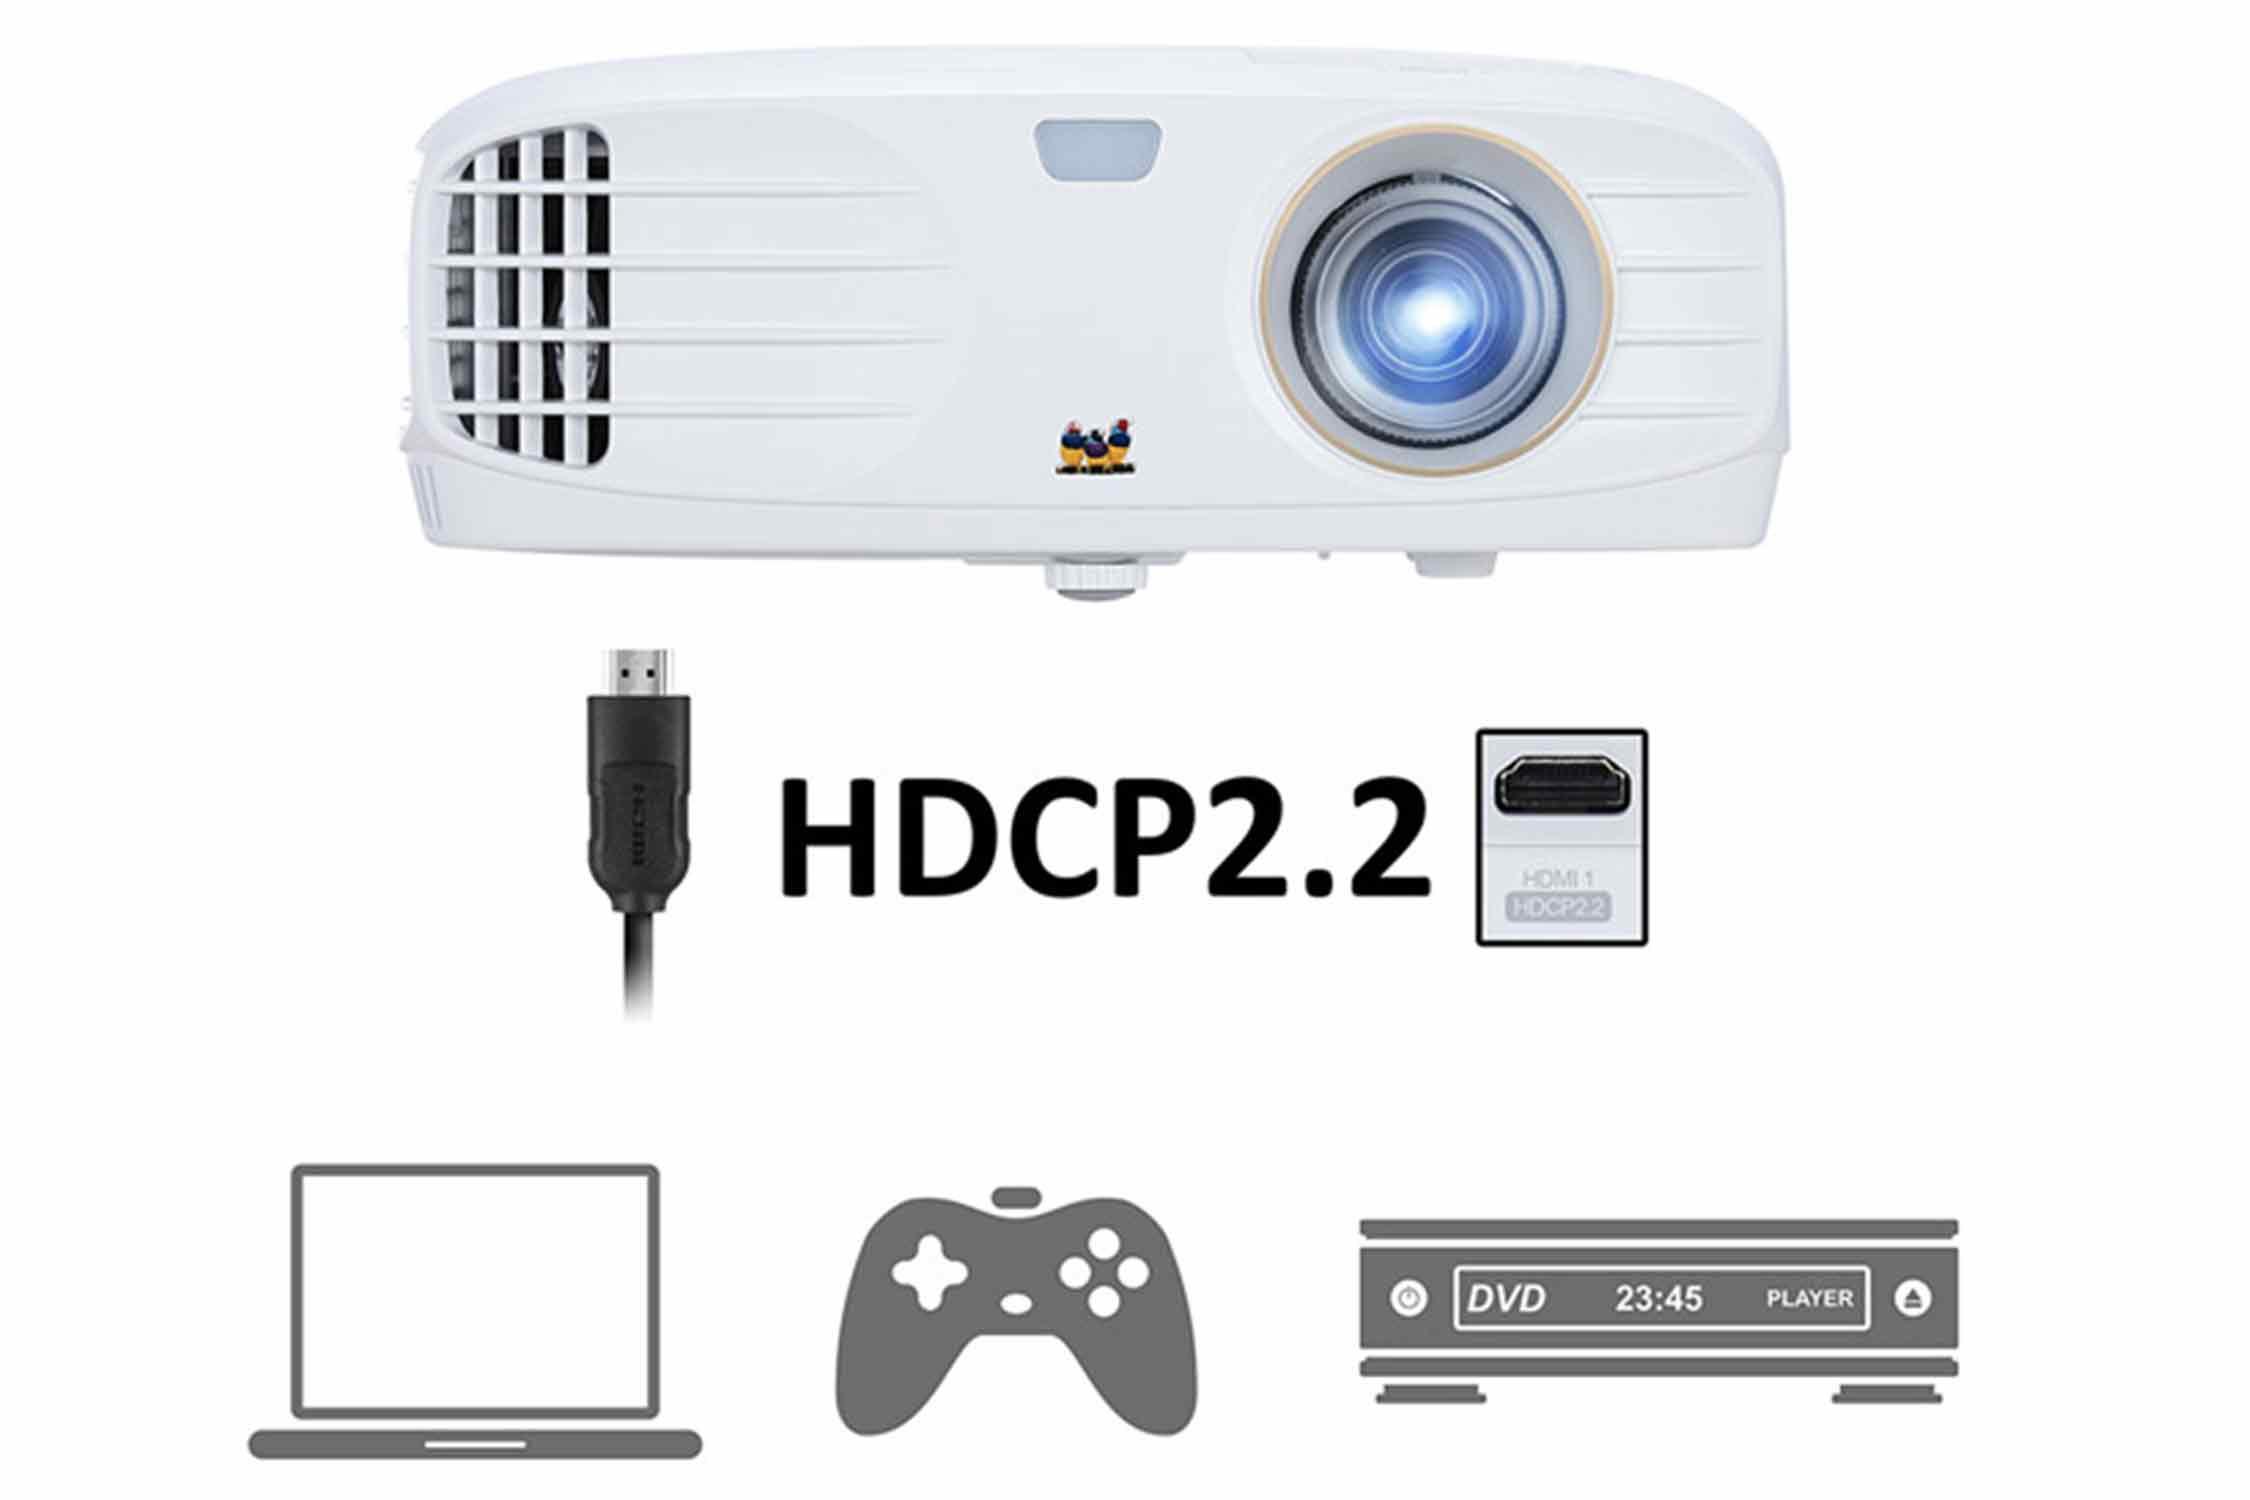 HDデバイスとの高い接続性 イメージ